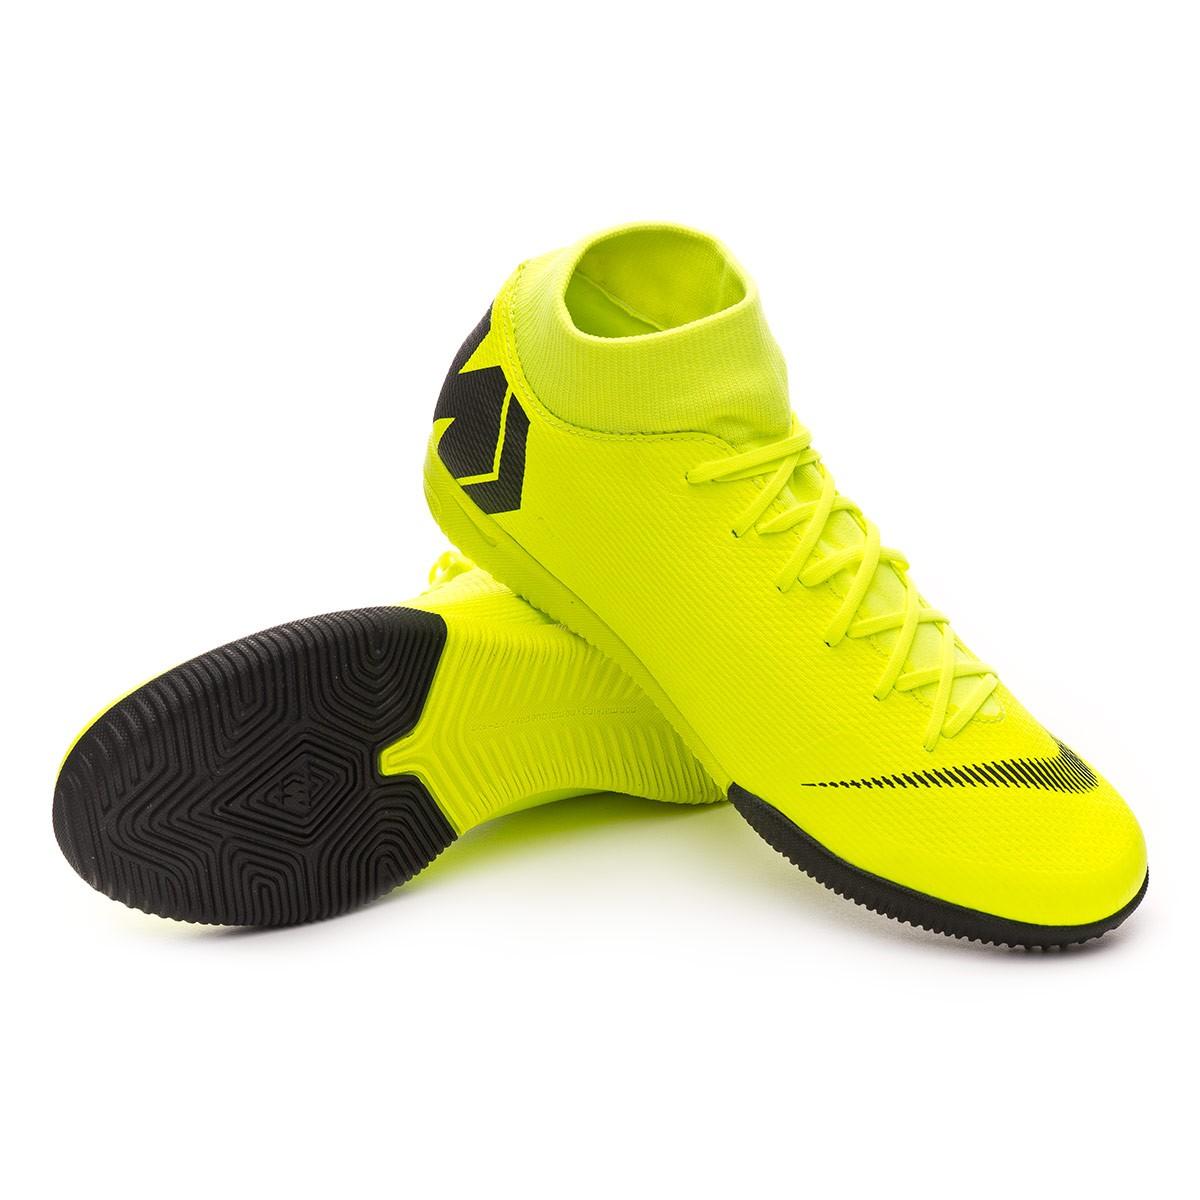 Chaussure de futsal Nike Mercurial SuperflyX VI Academy IC Volt ...